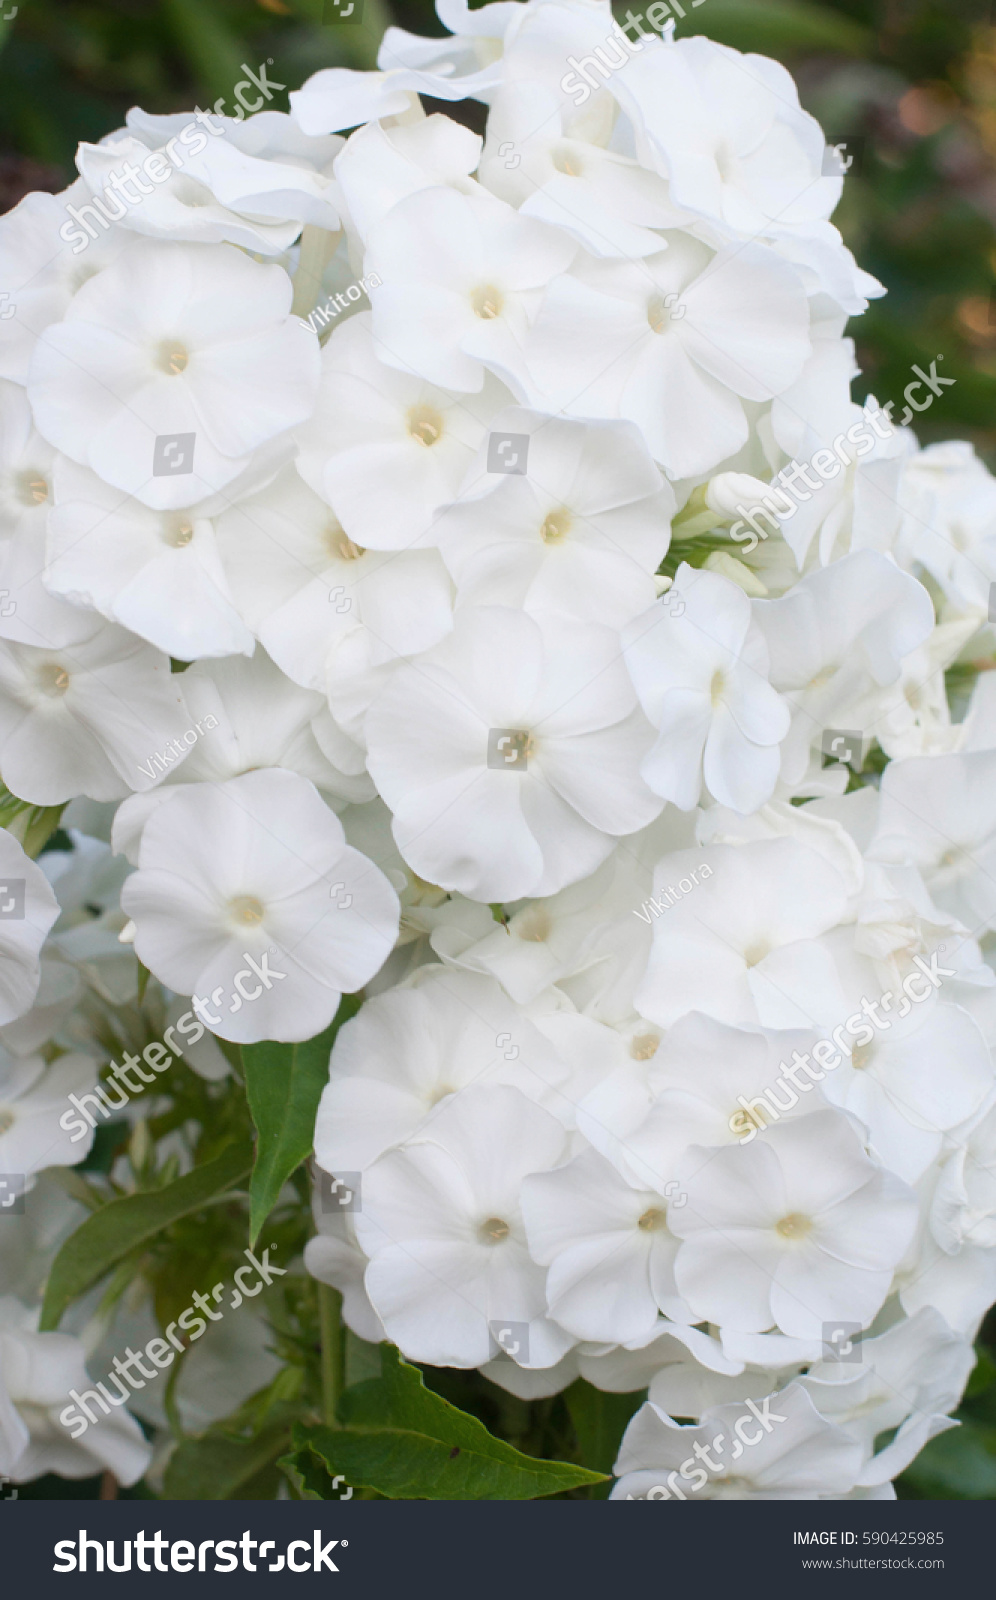 summer phlox bloom stock photo 590425985 shutterstock. Black Bedroom Furniture Sets. Home Design Ideas